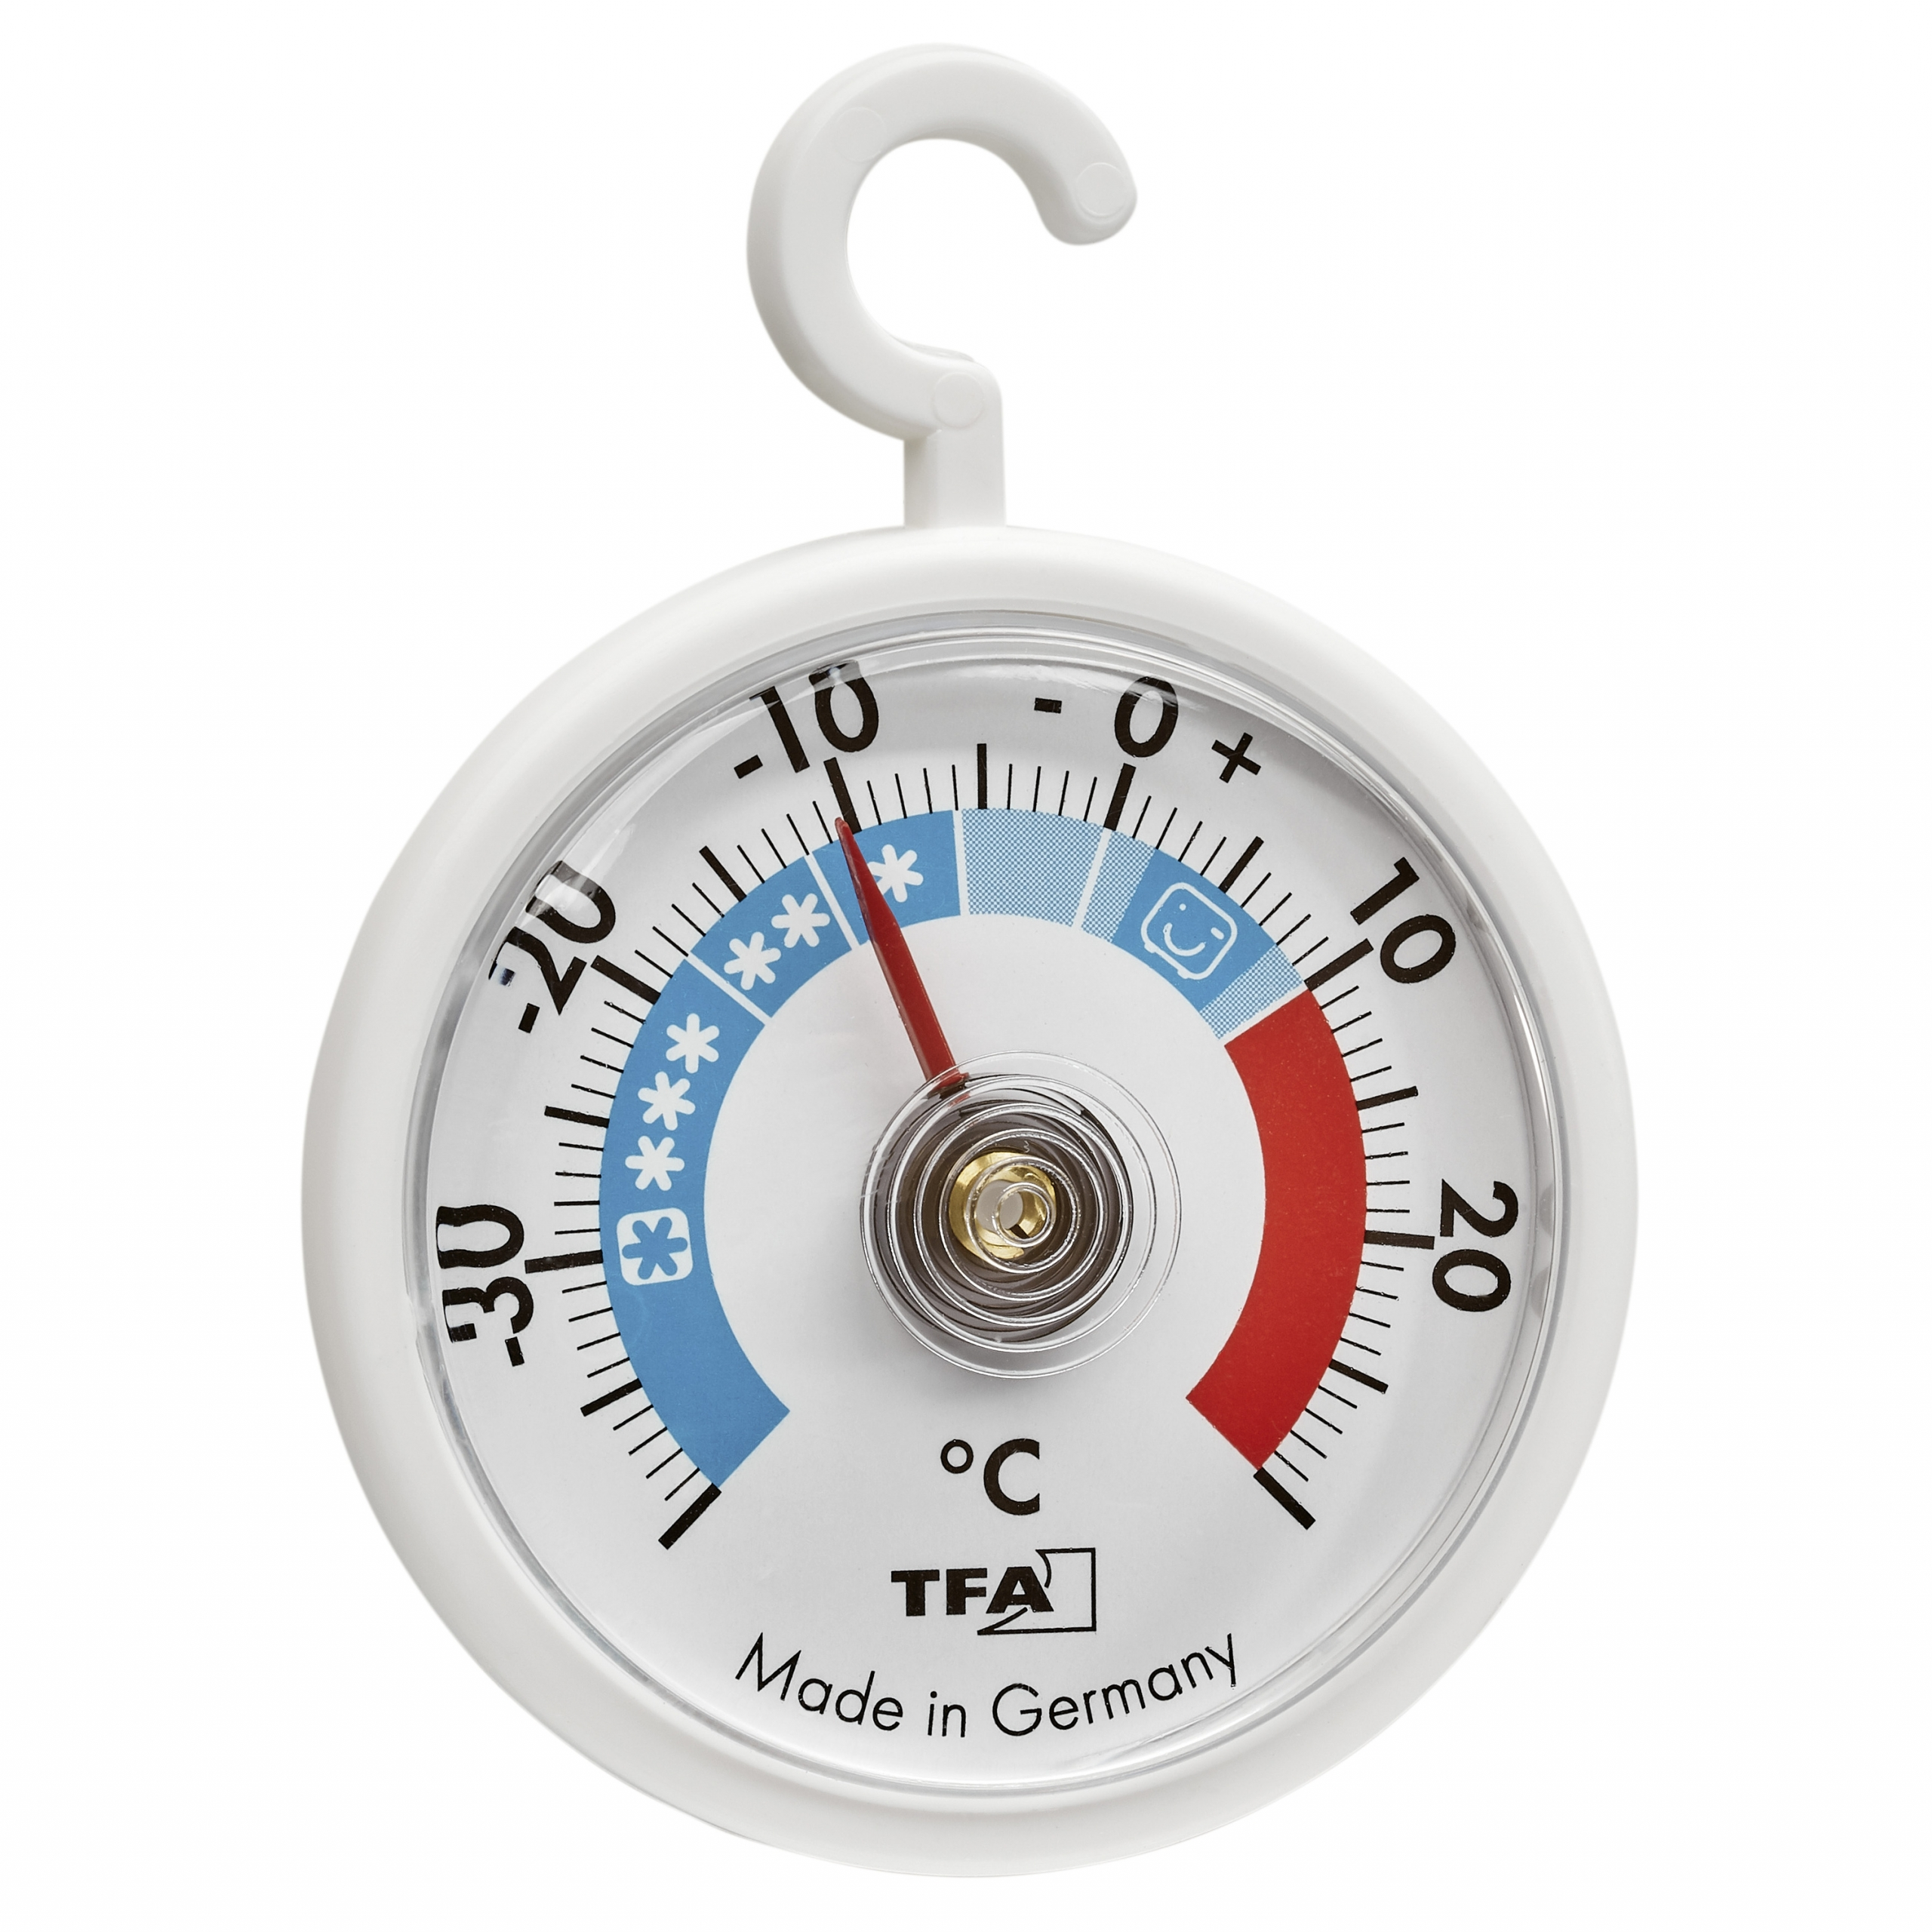 14-4005-analoges-kühlthermometer-1200x01200px.jpg